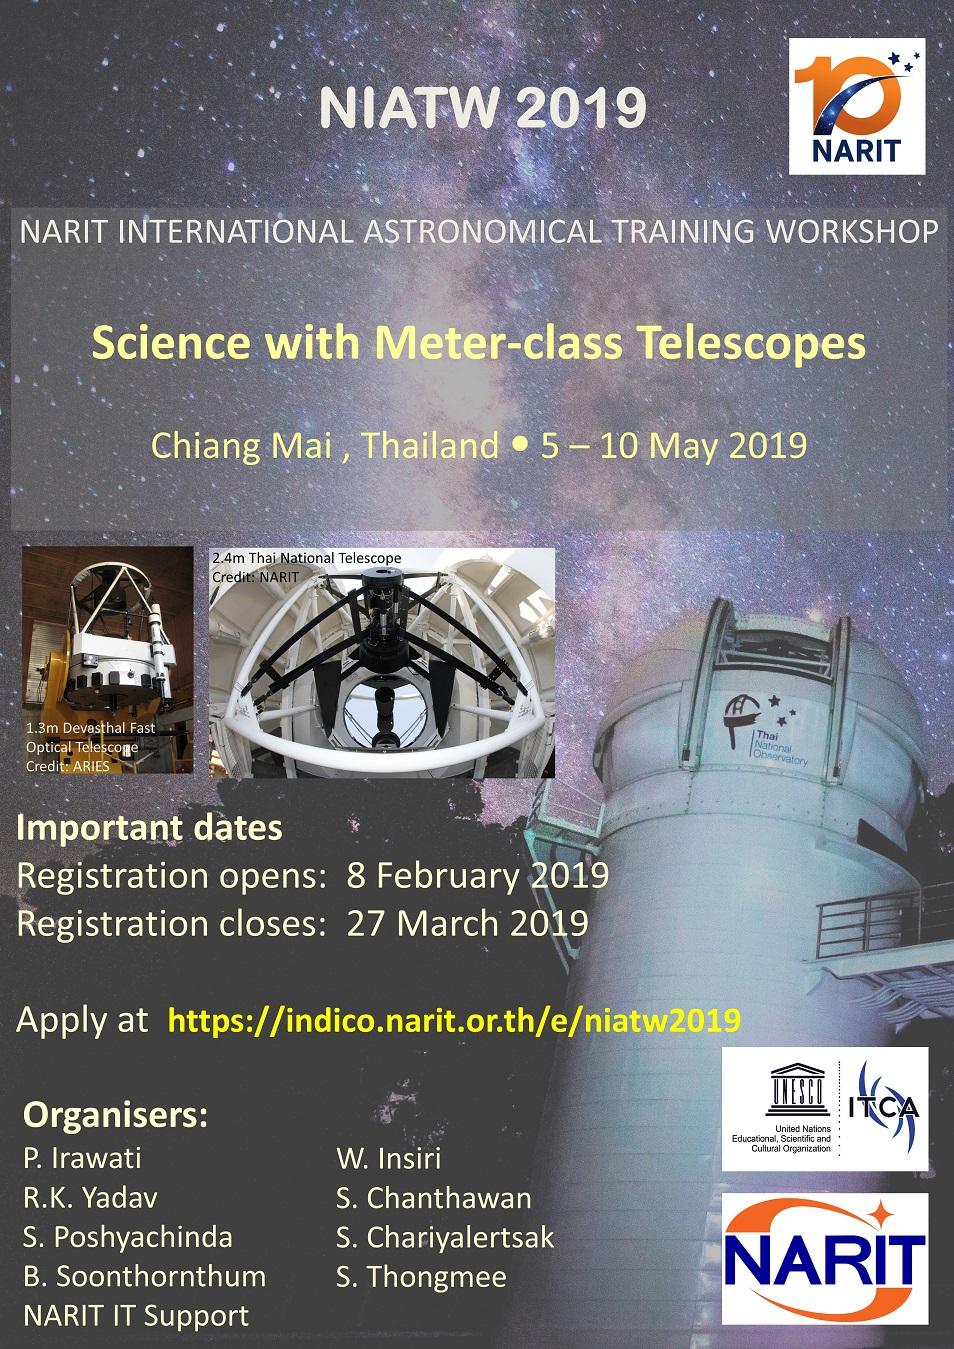 NARIT International Astronomical Training Workshop 2019 (5